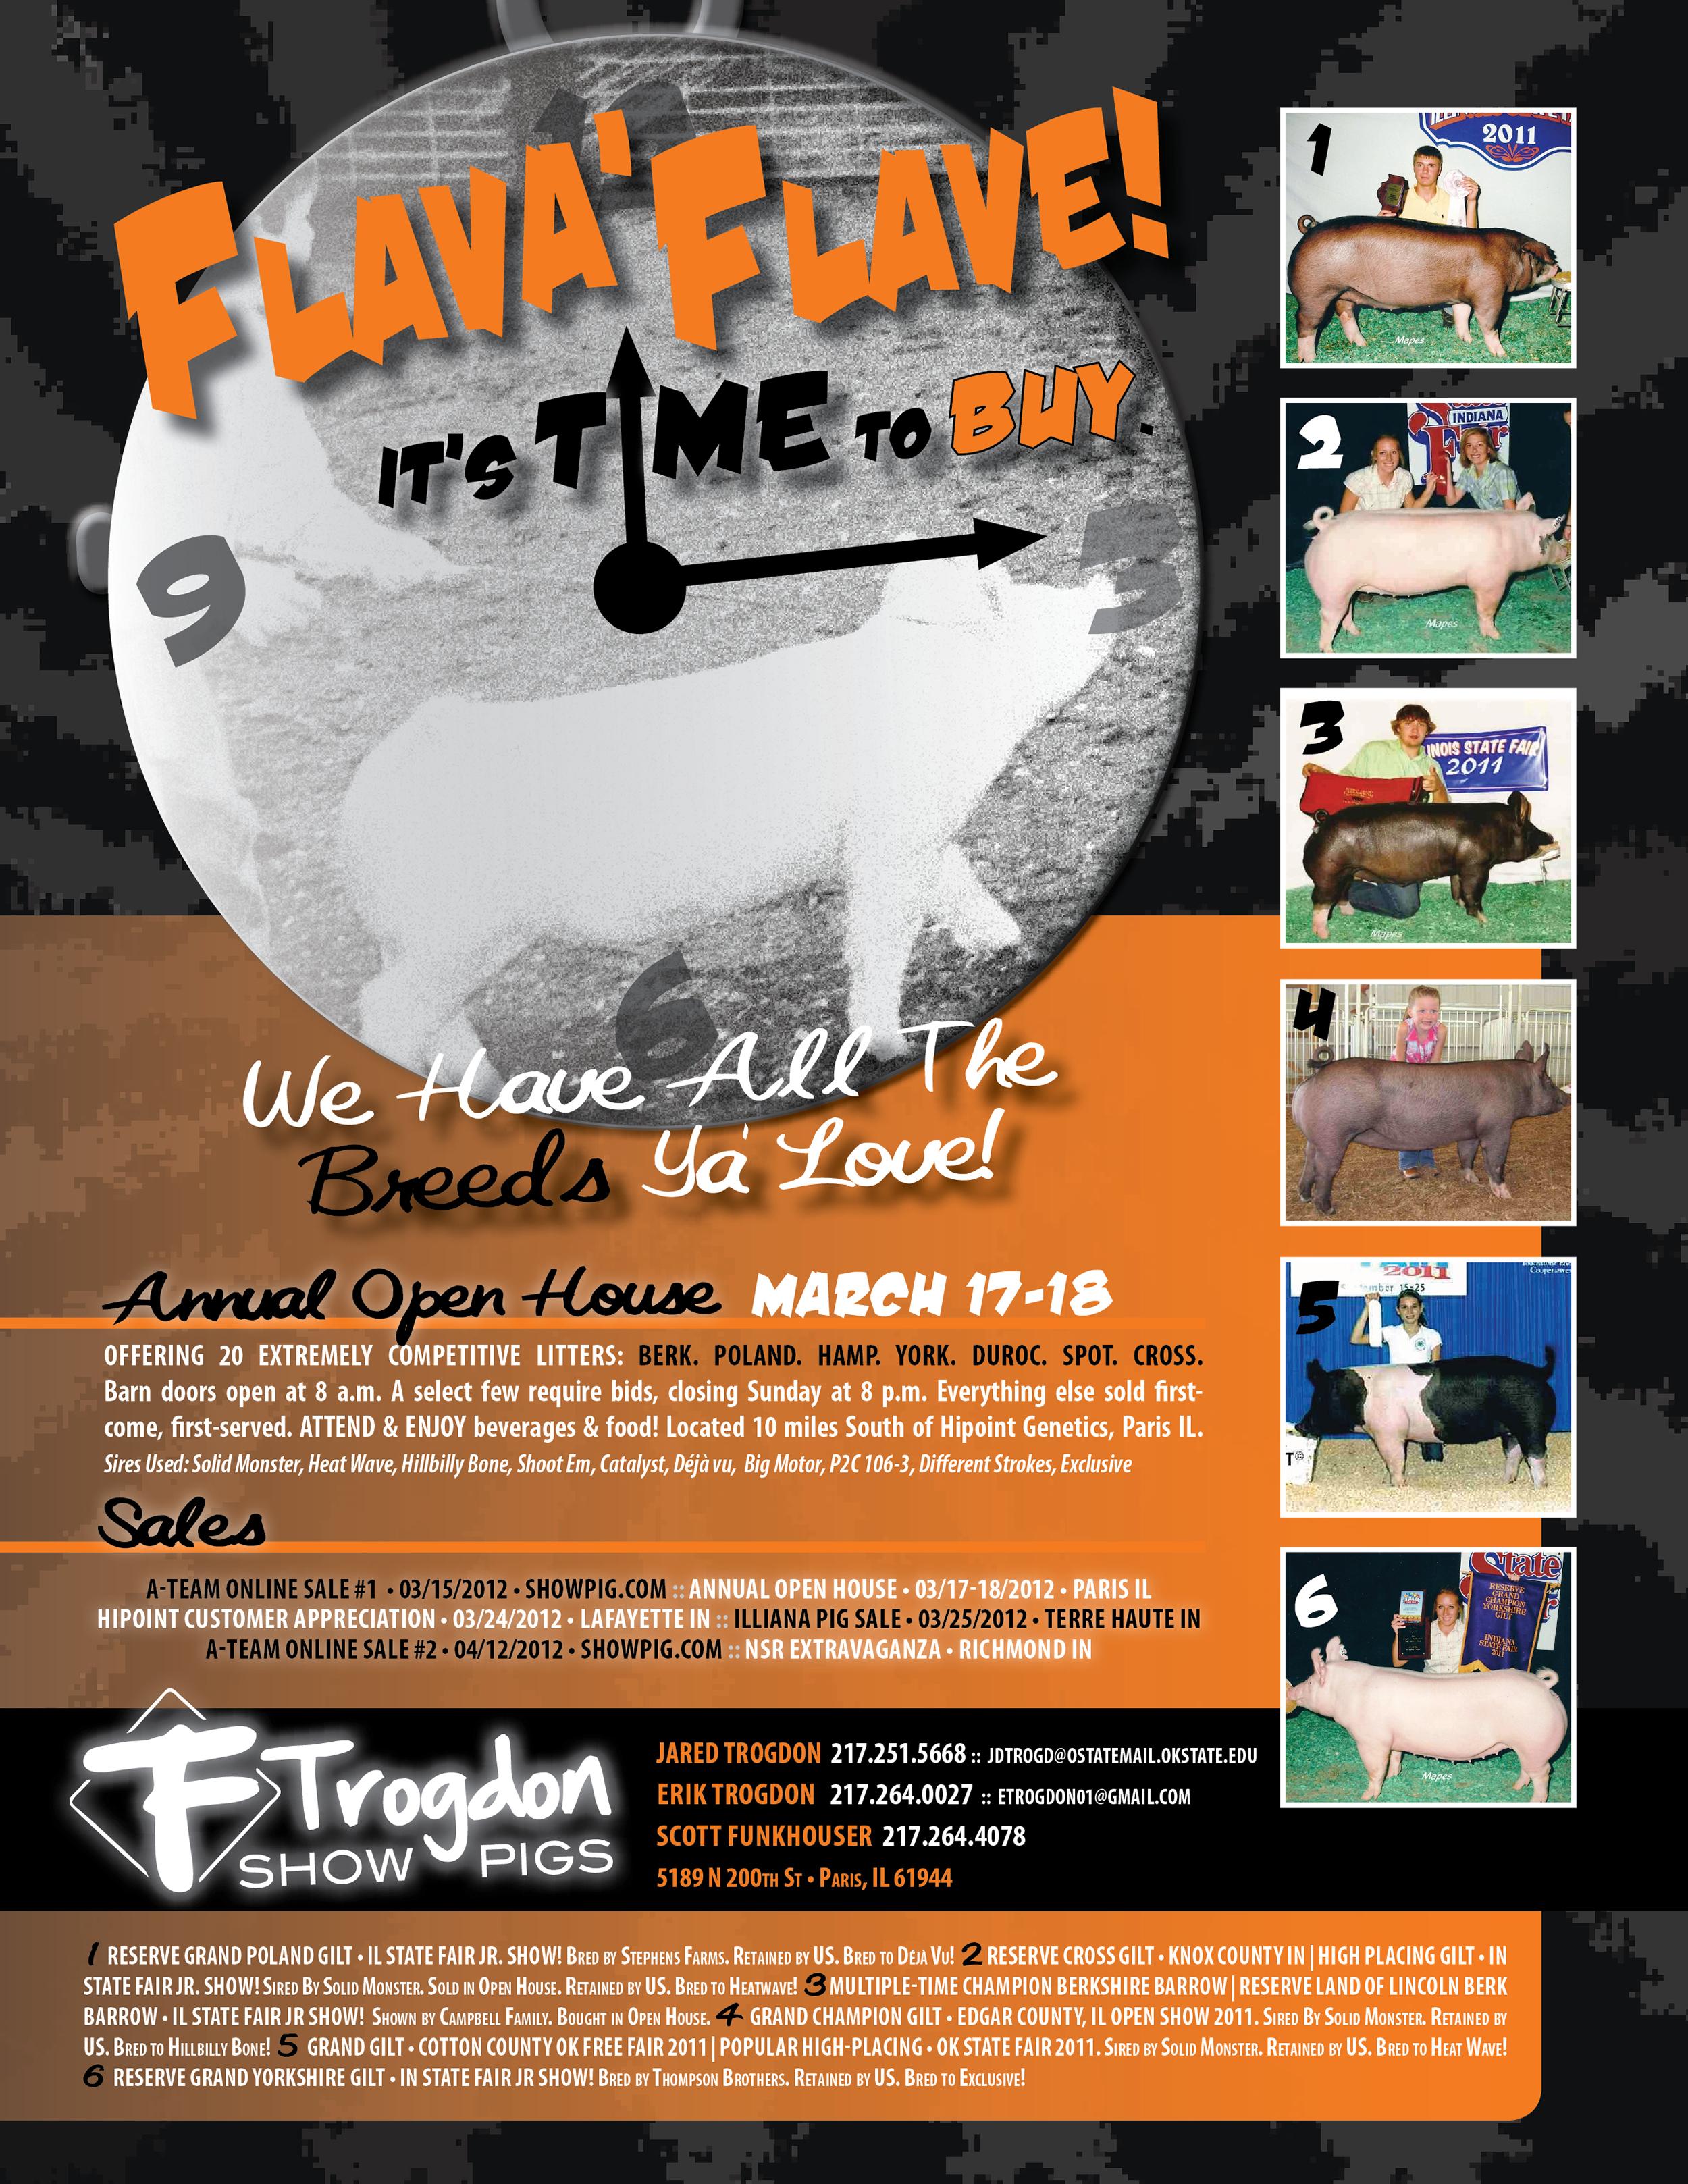 Trogdon-Show-Pigs_S12_FLAV-advertisement.jpg